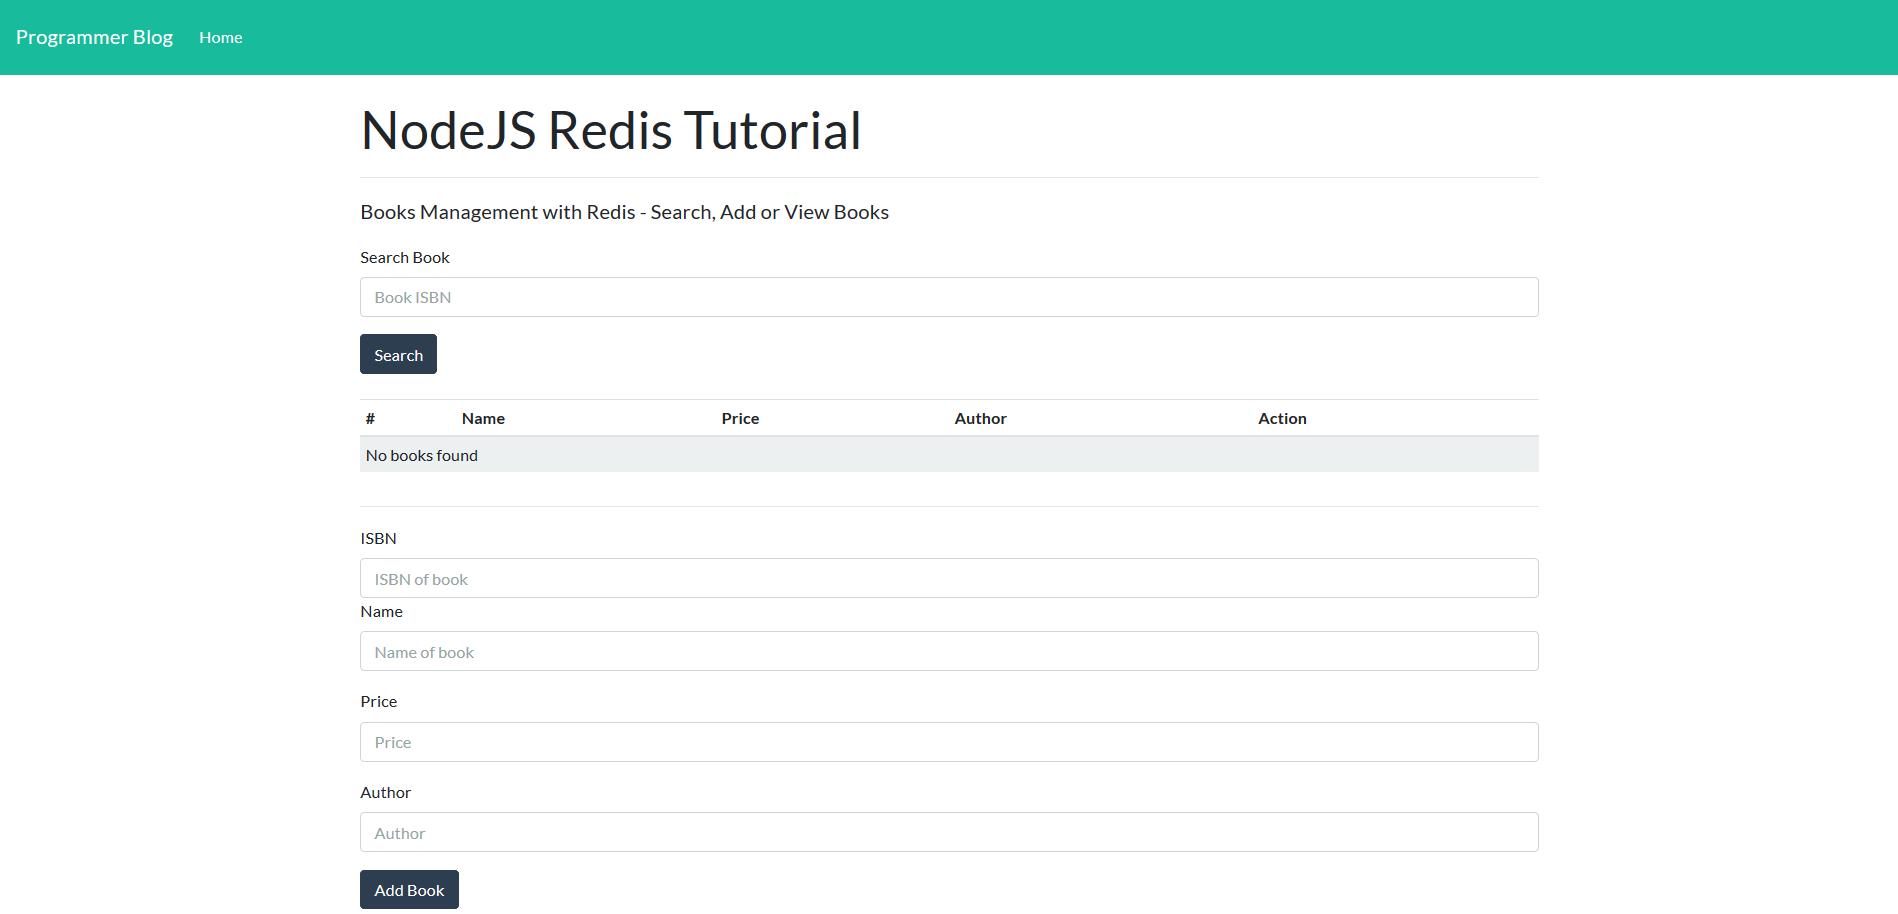 nodejs redis tutorial - complete form